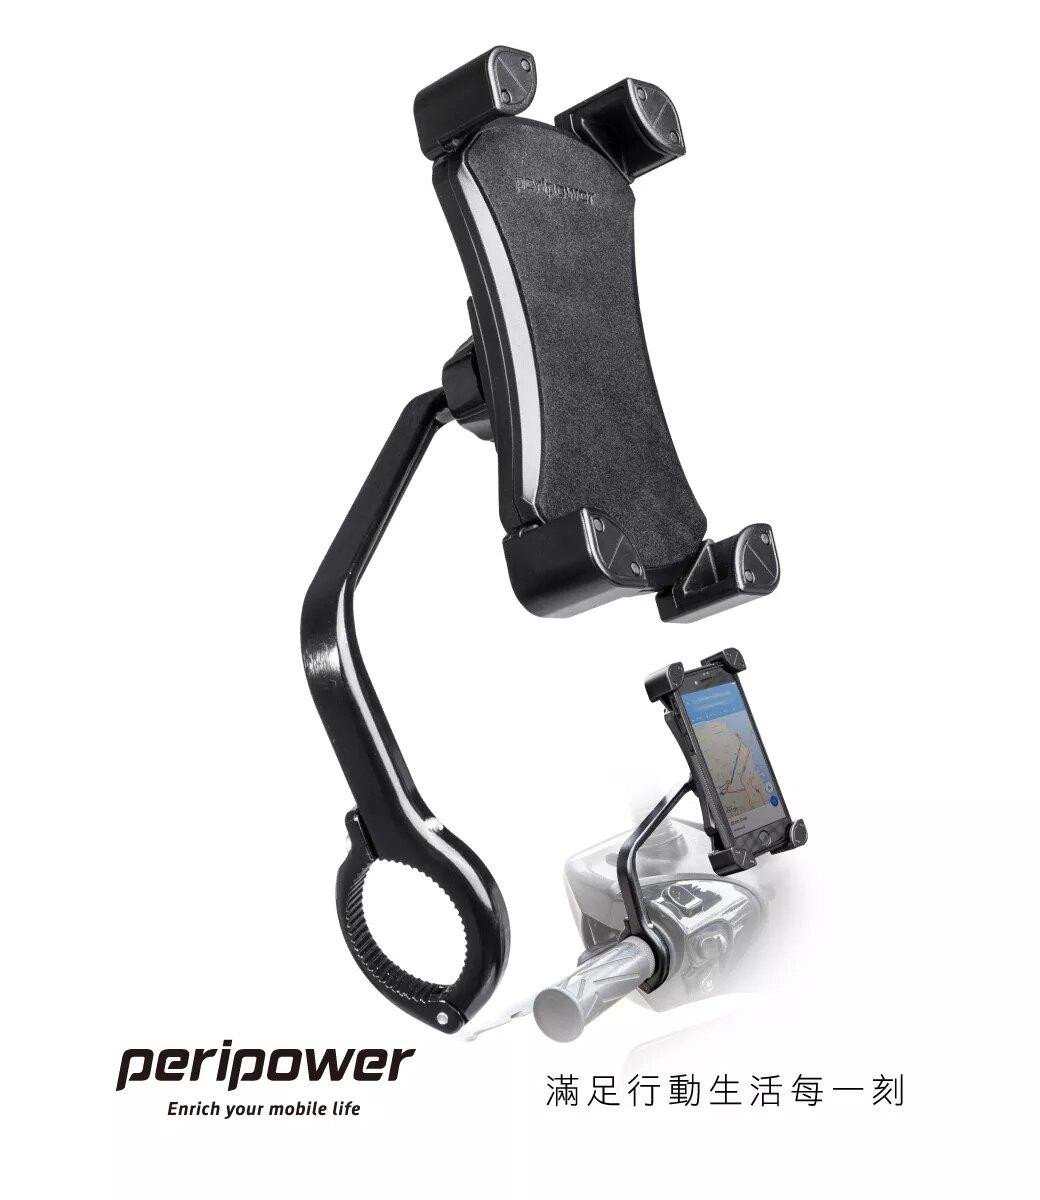 「3C特選」peripower MT-MC01 握把式鋁合金機車手機架 手機握把架 手把架 握把架 手機支架